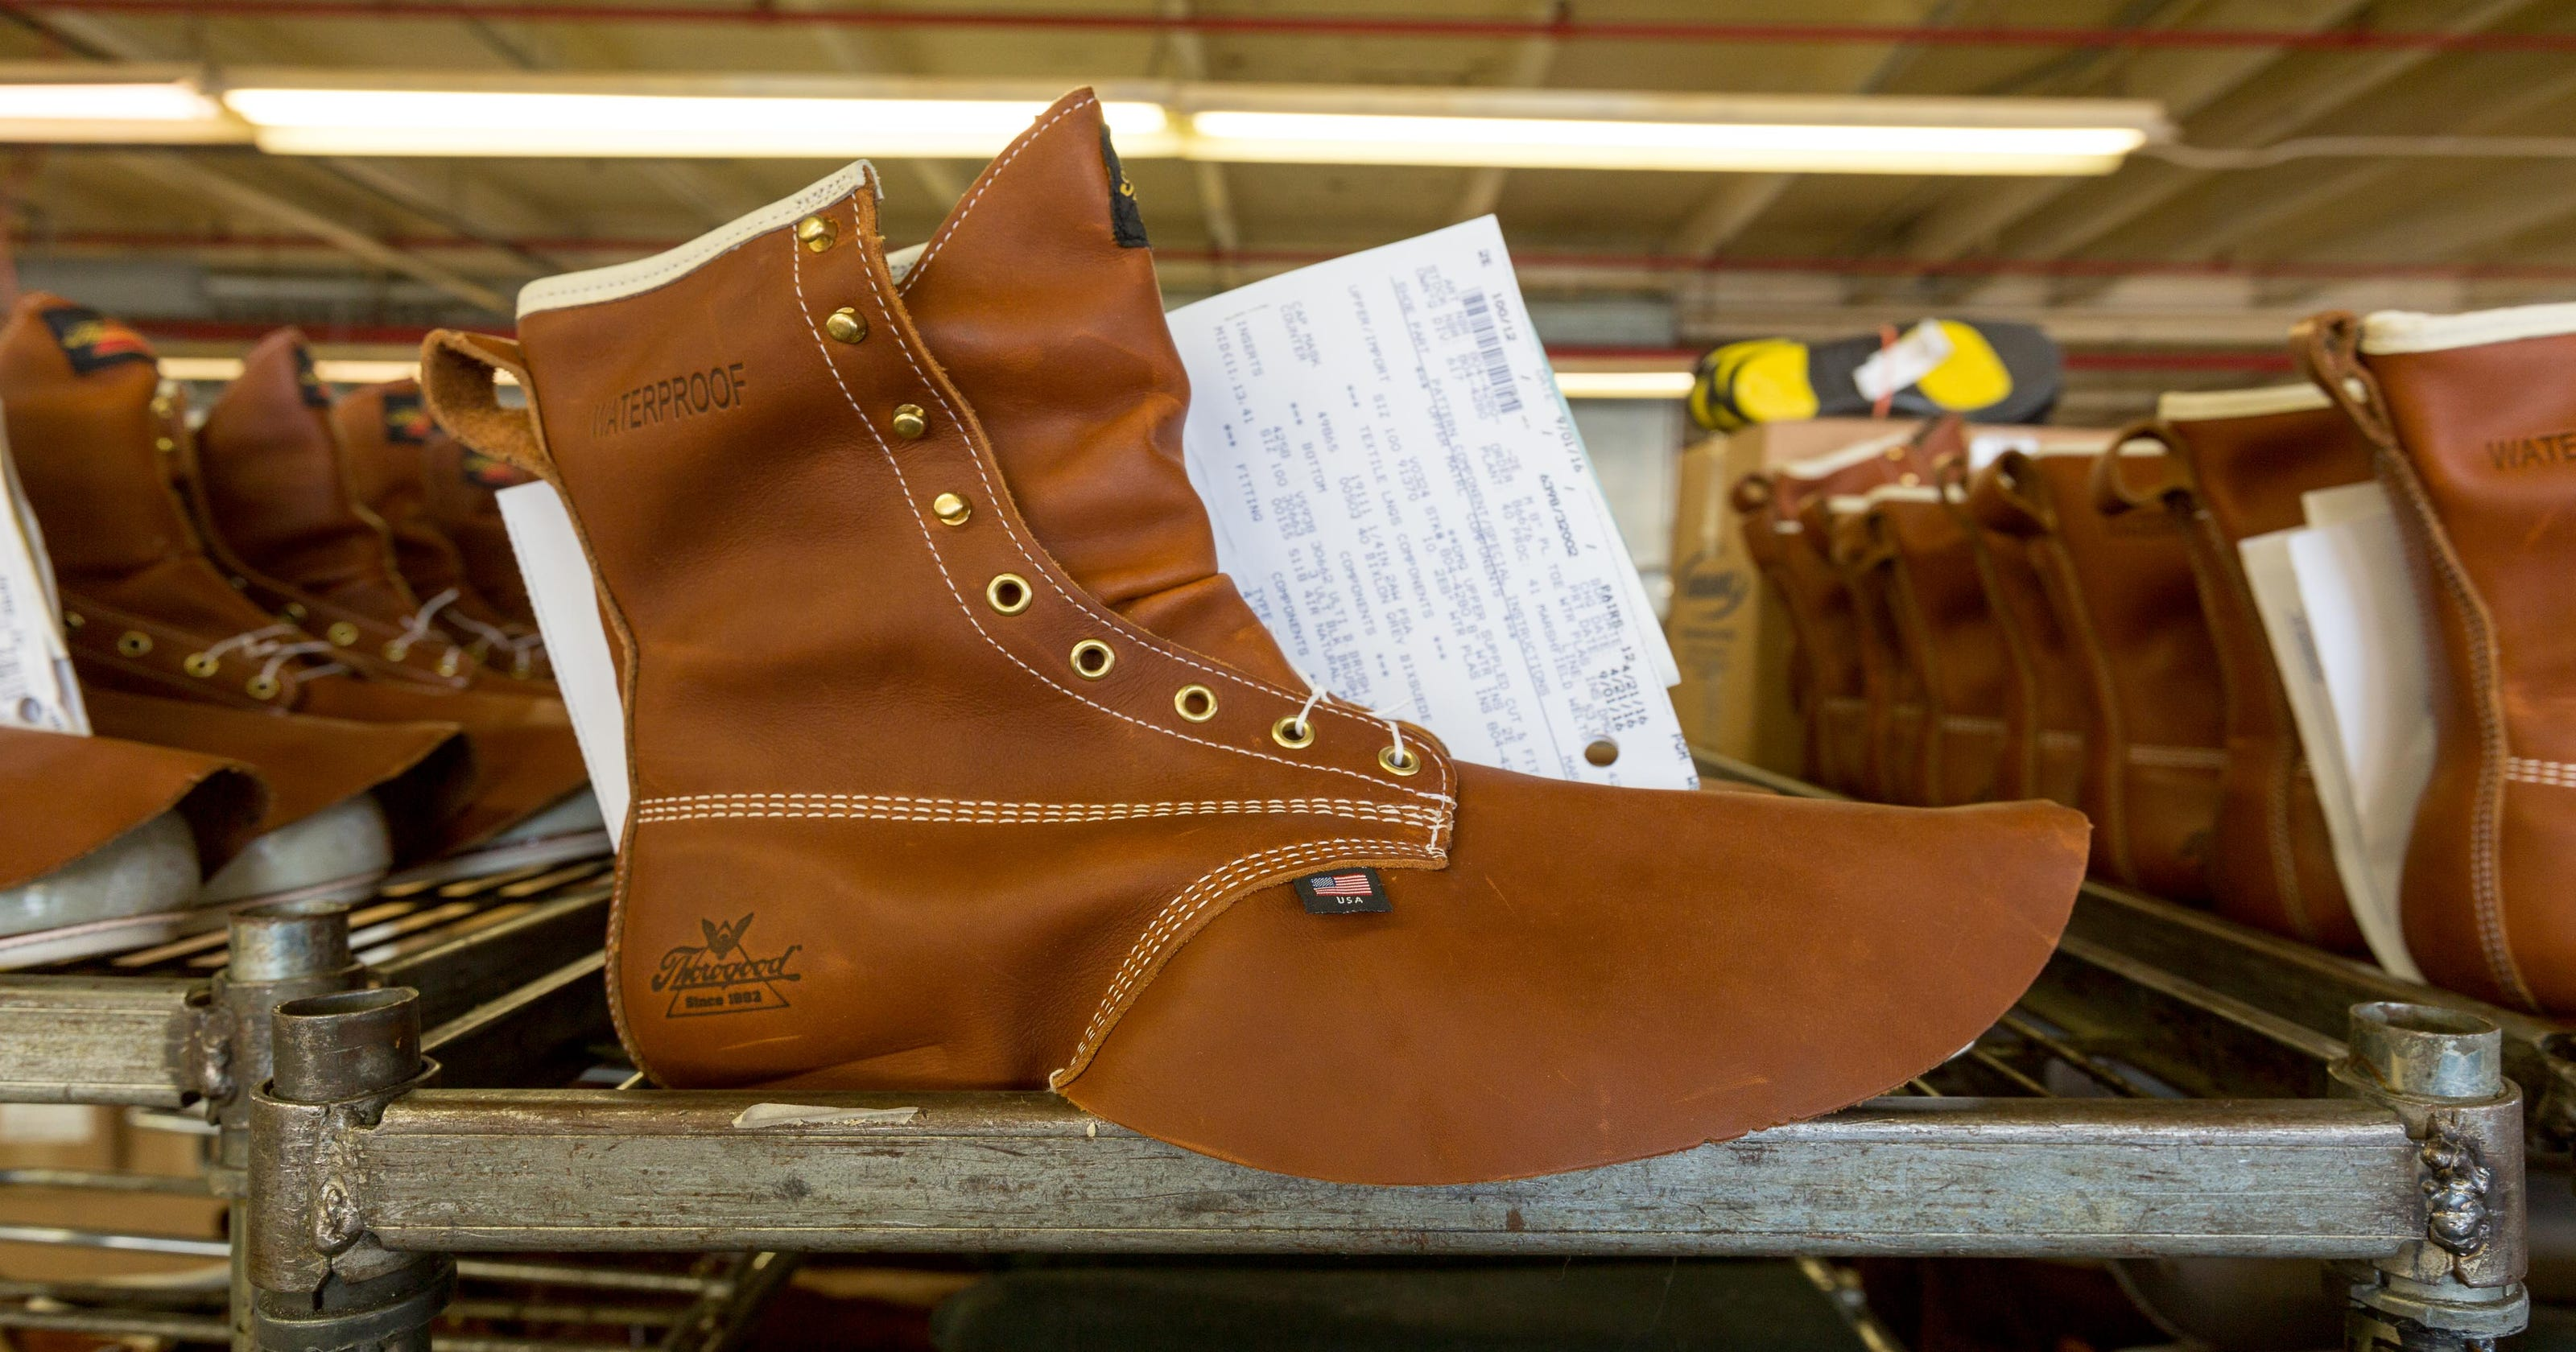 044ca3f1bdf This Marshfield company makes artisanal boots